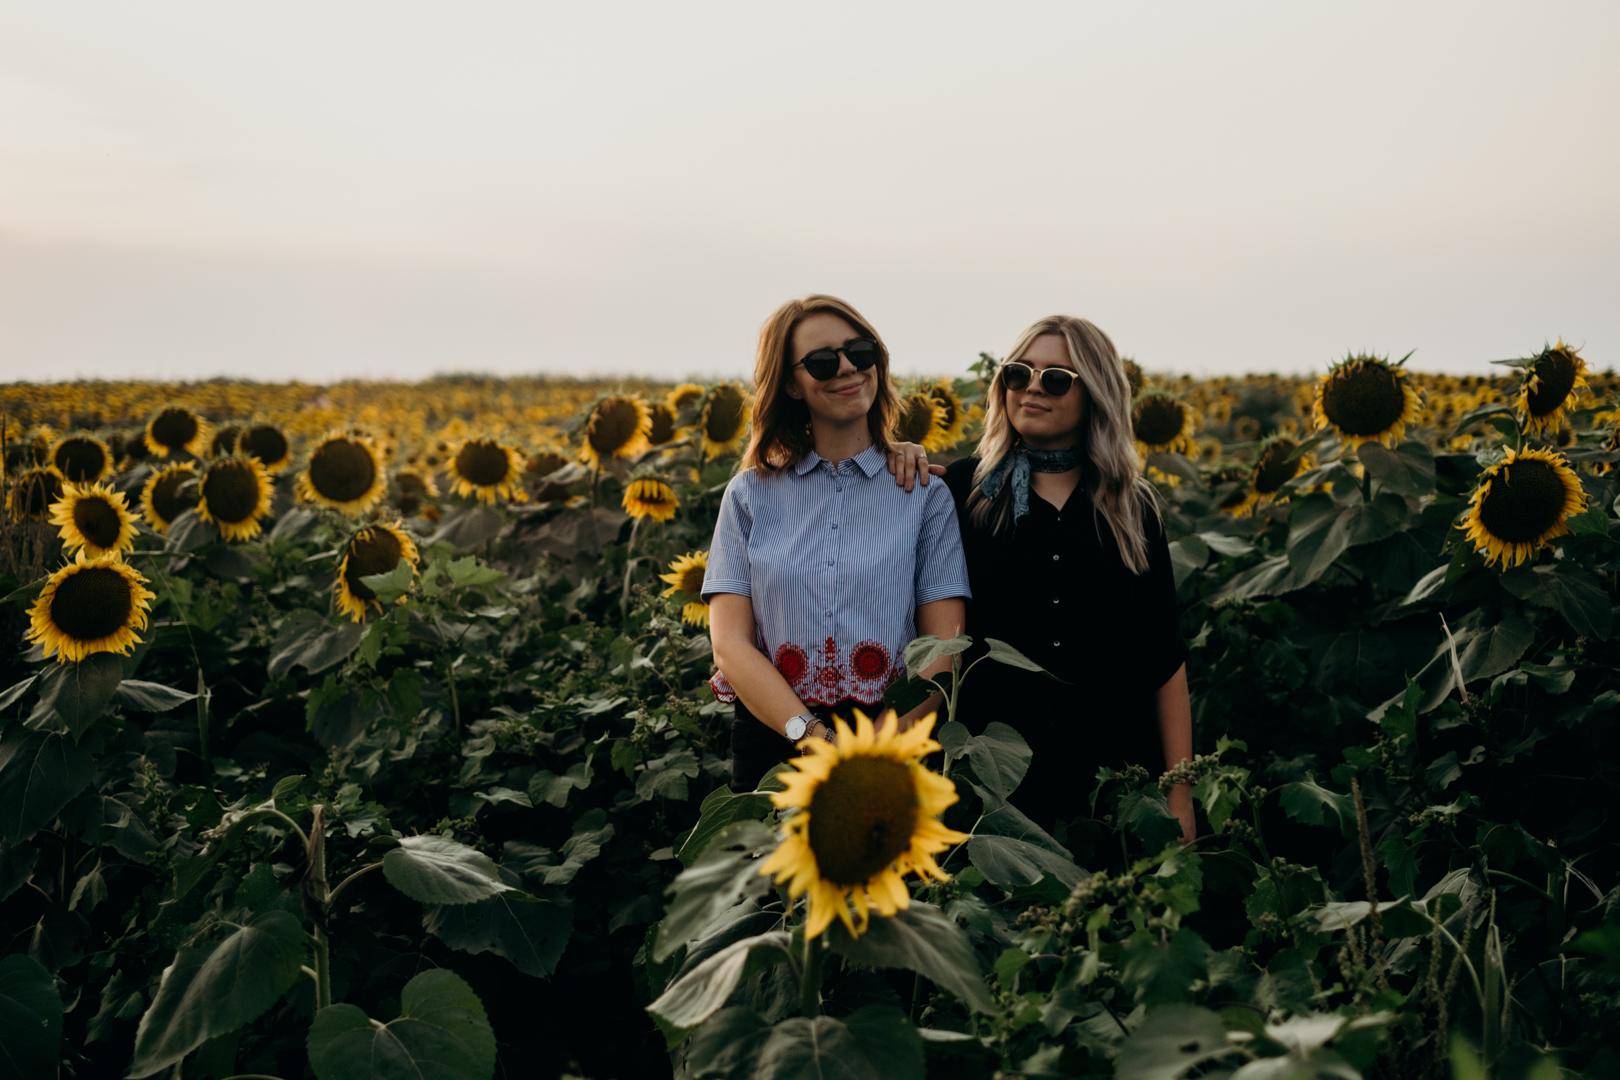 20170909_Grinters Farms Sunflower Fields Lawrence Kansas__22.jpg